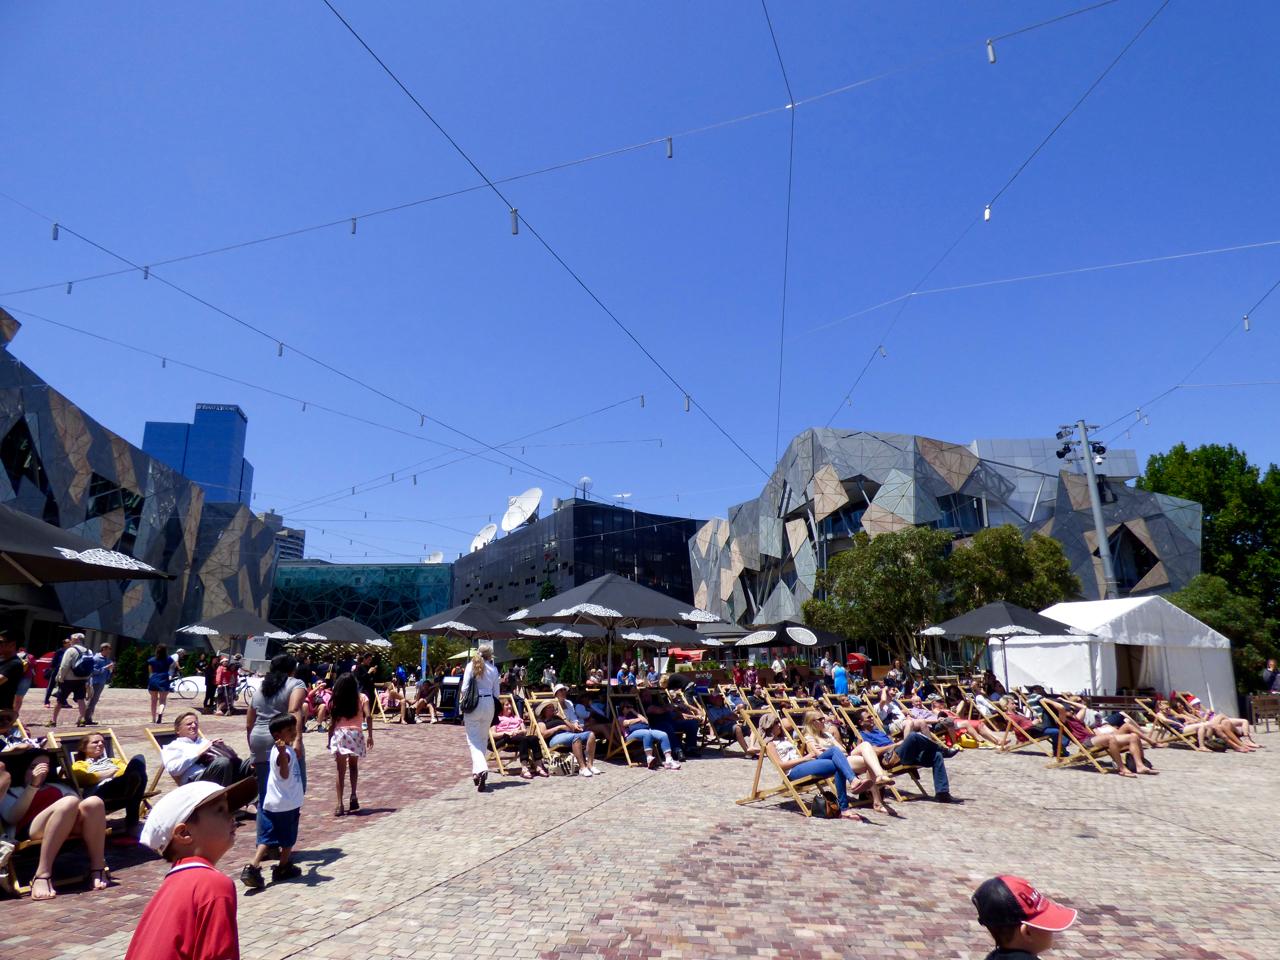 Federation Square Melbourne, Australia